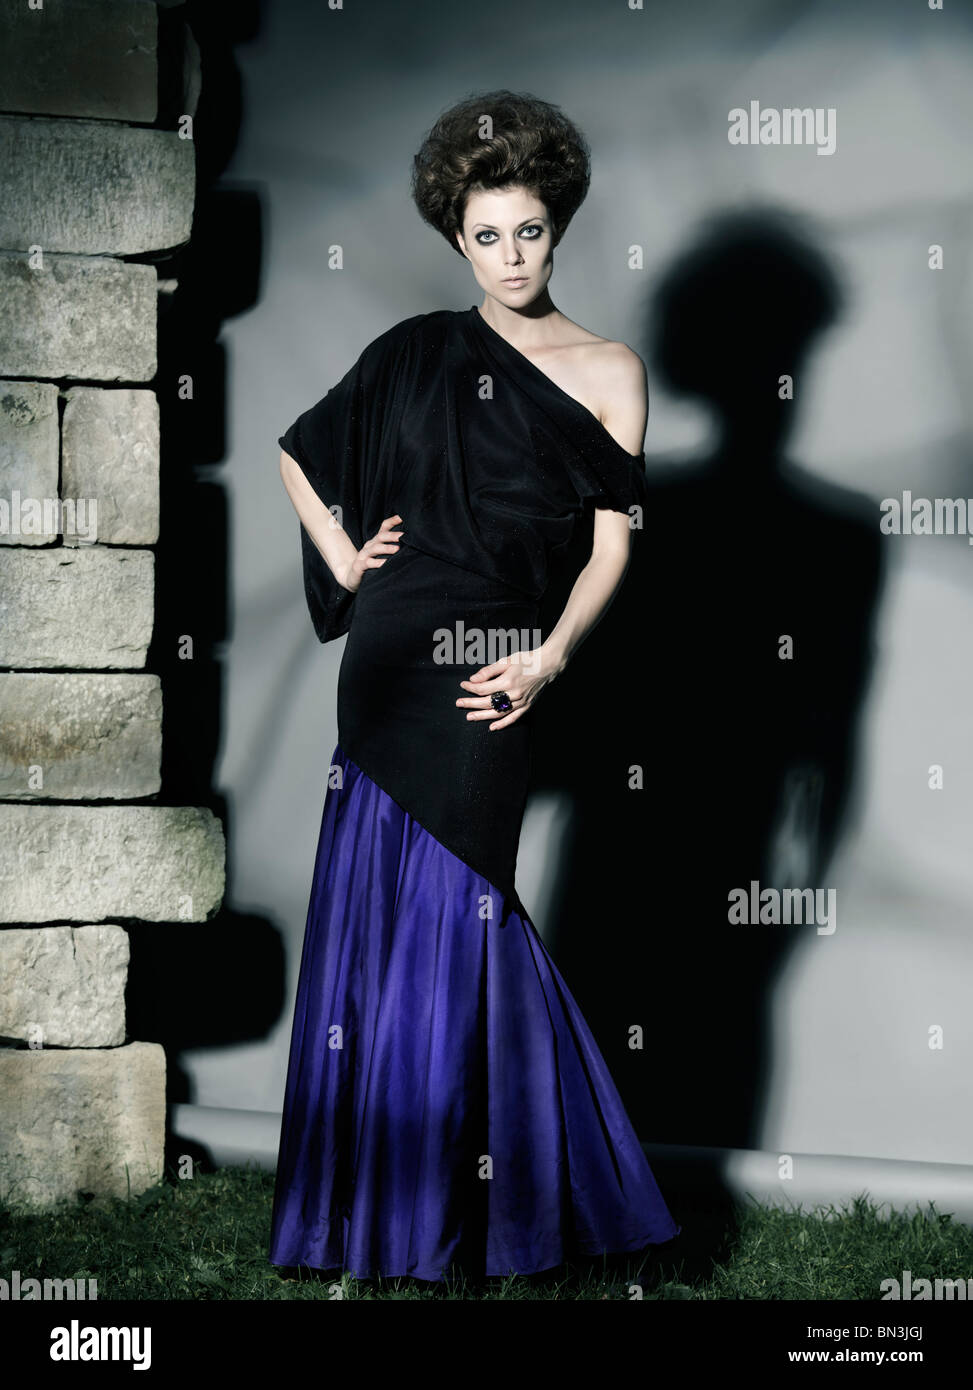 High fashion photo of a beautiful woman wearing elegant long dress - Stock Image